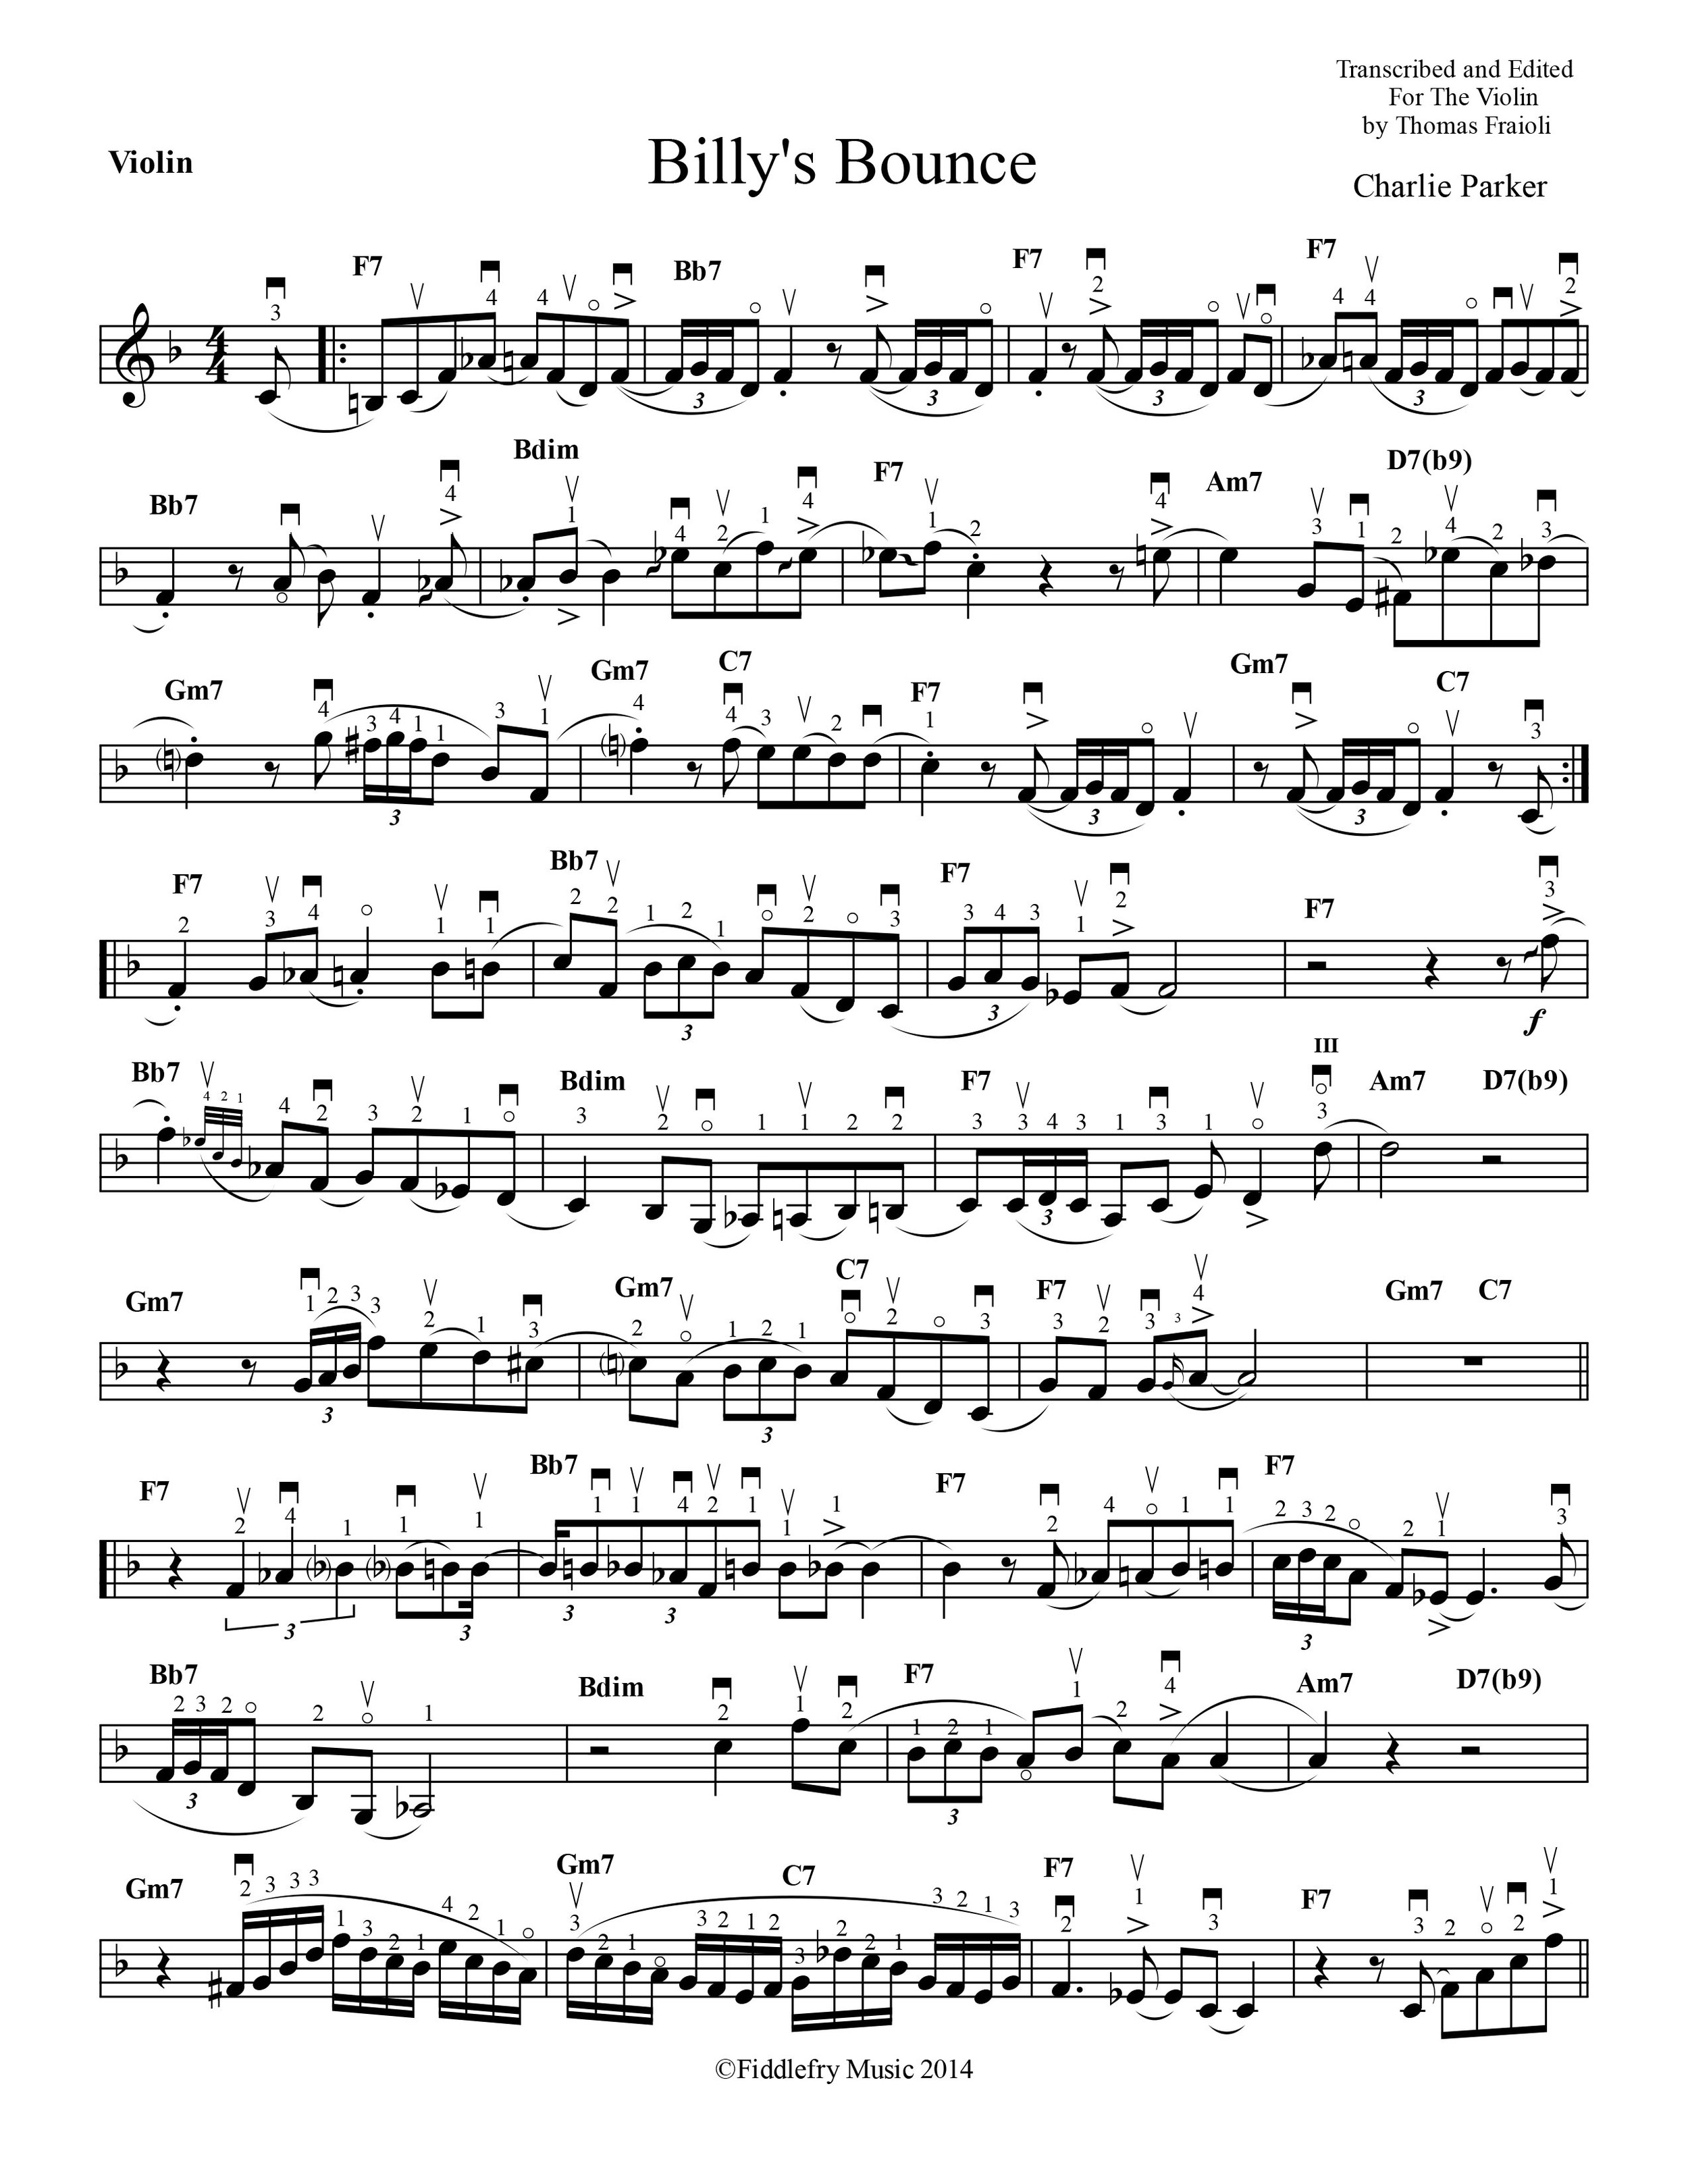 Charlie Parker Fiddlefry Music